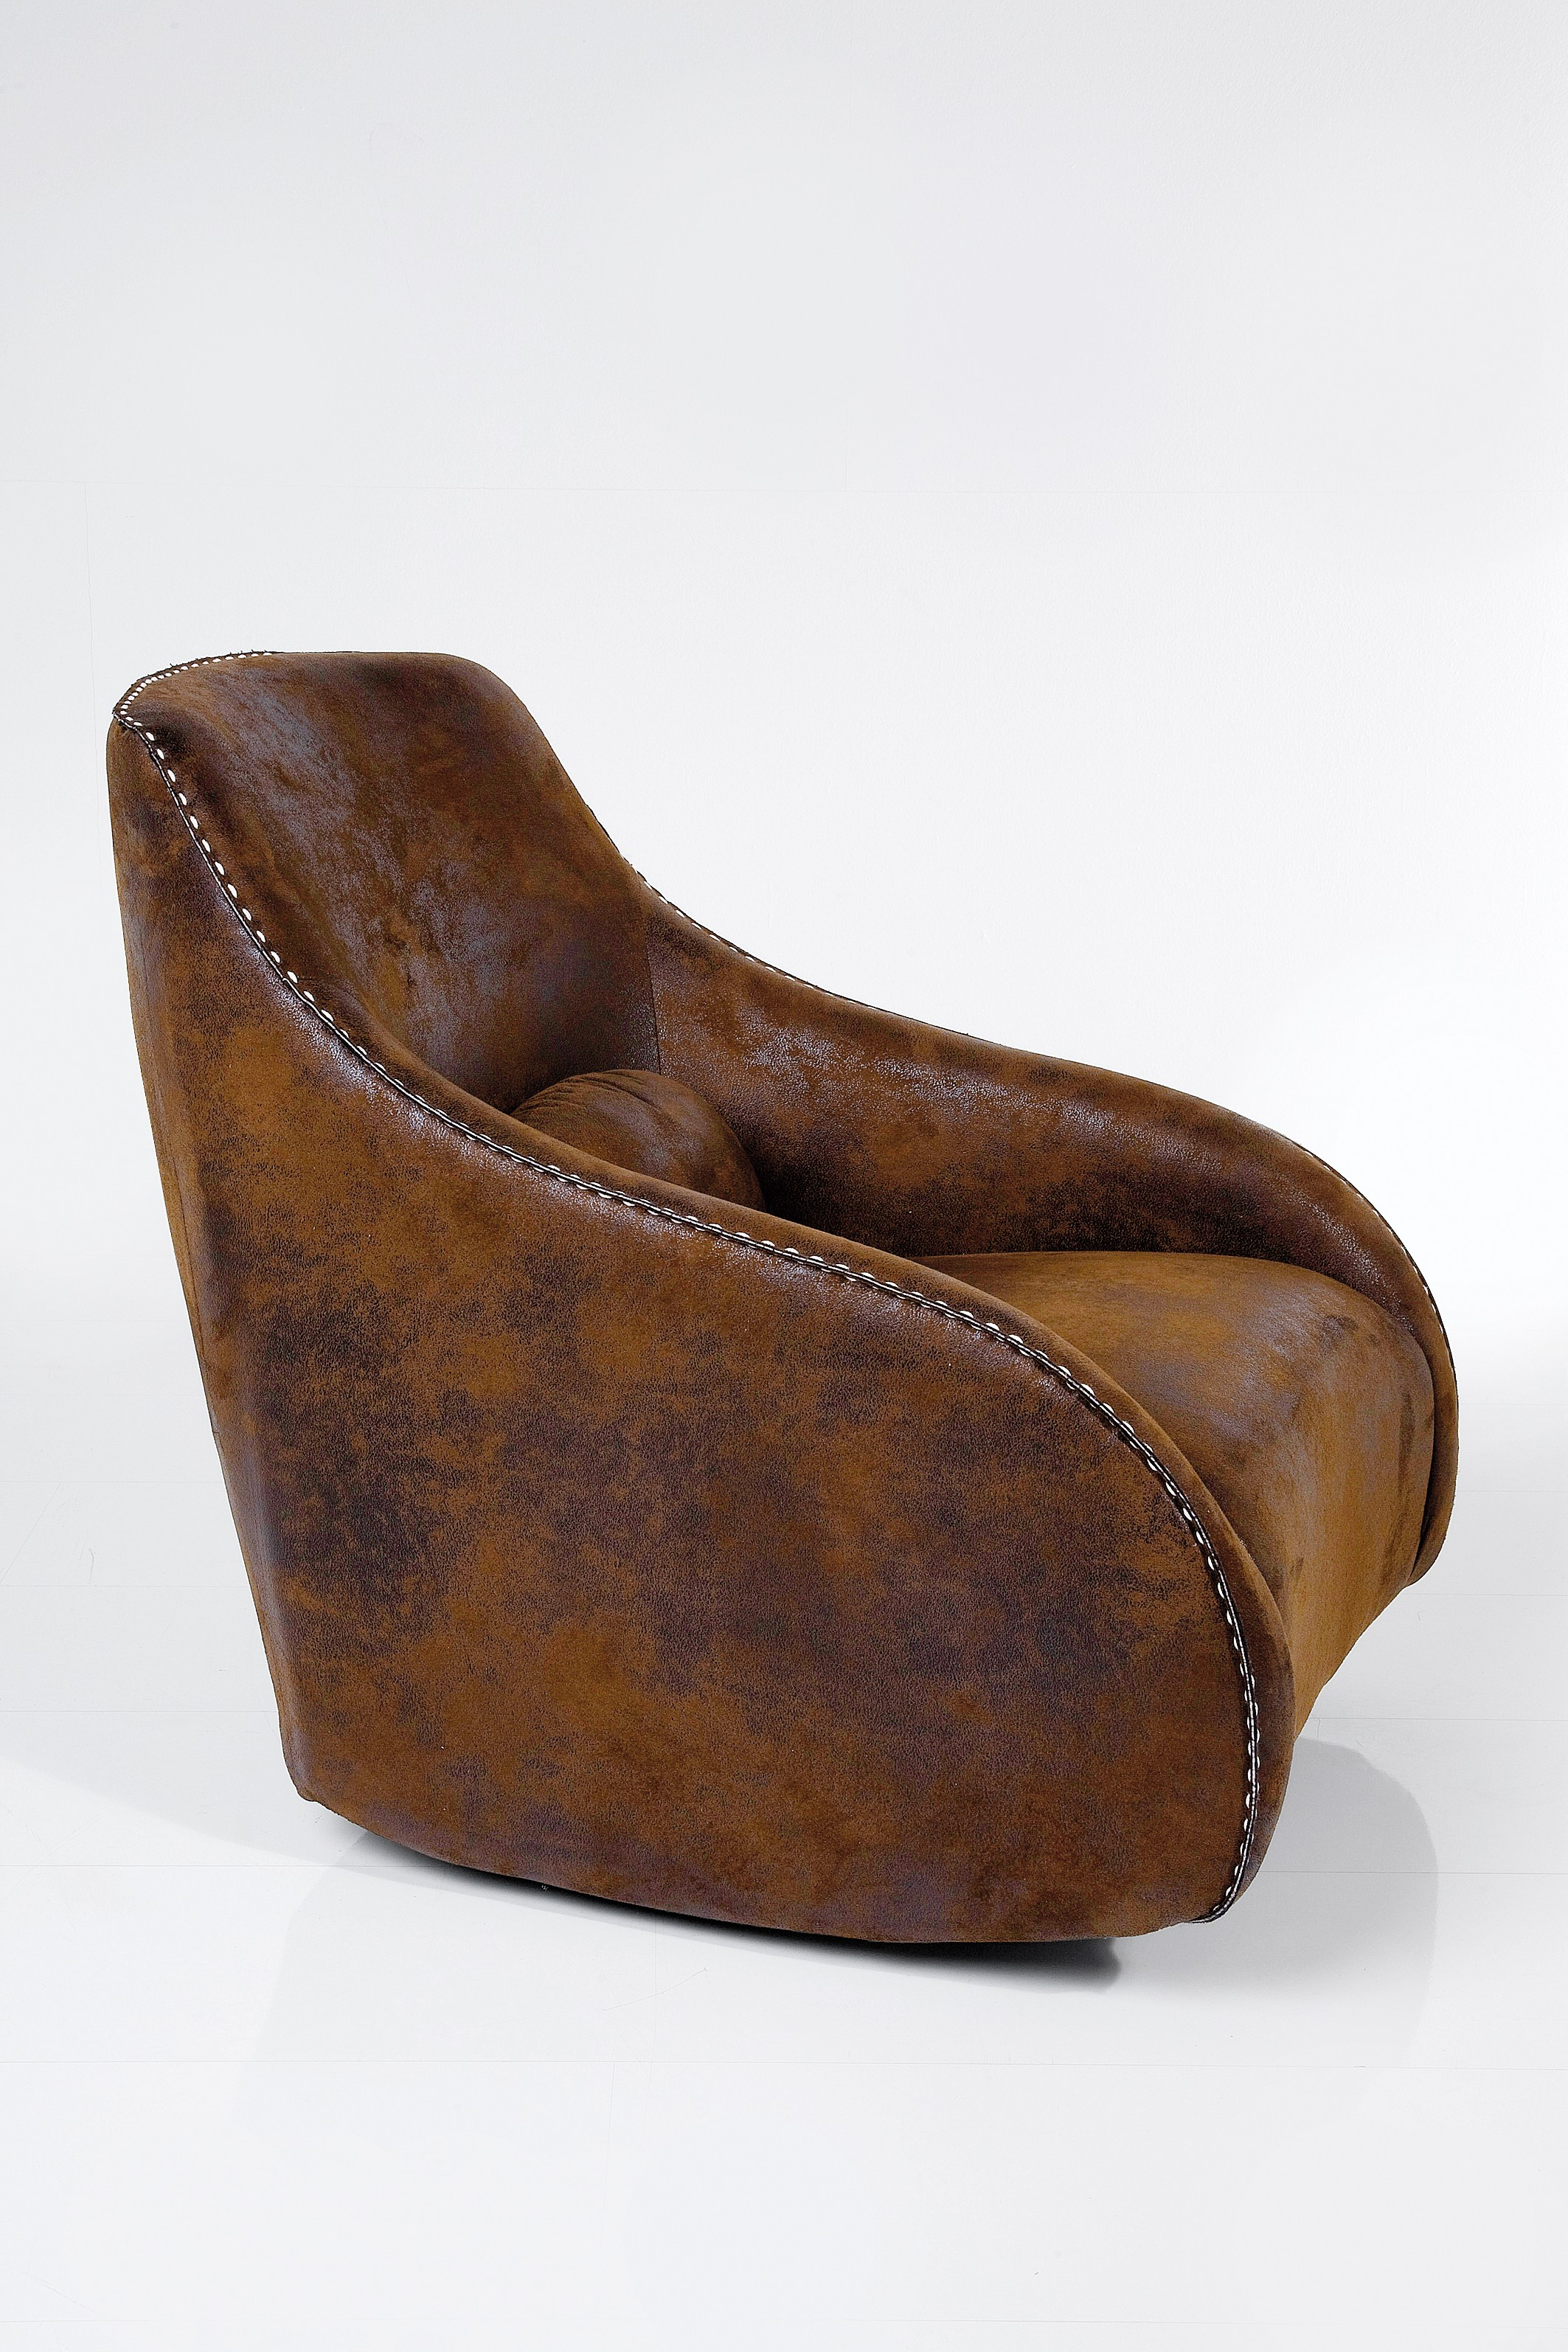 Salotto Pelle Vintage: Divano vintage in pelle marrone abbott il ...